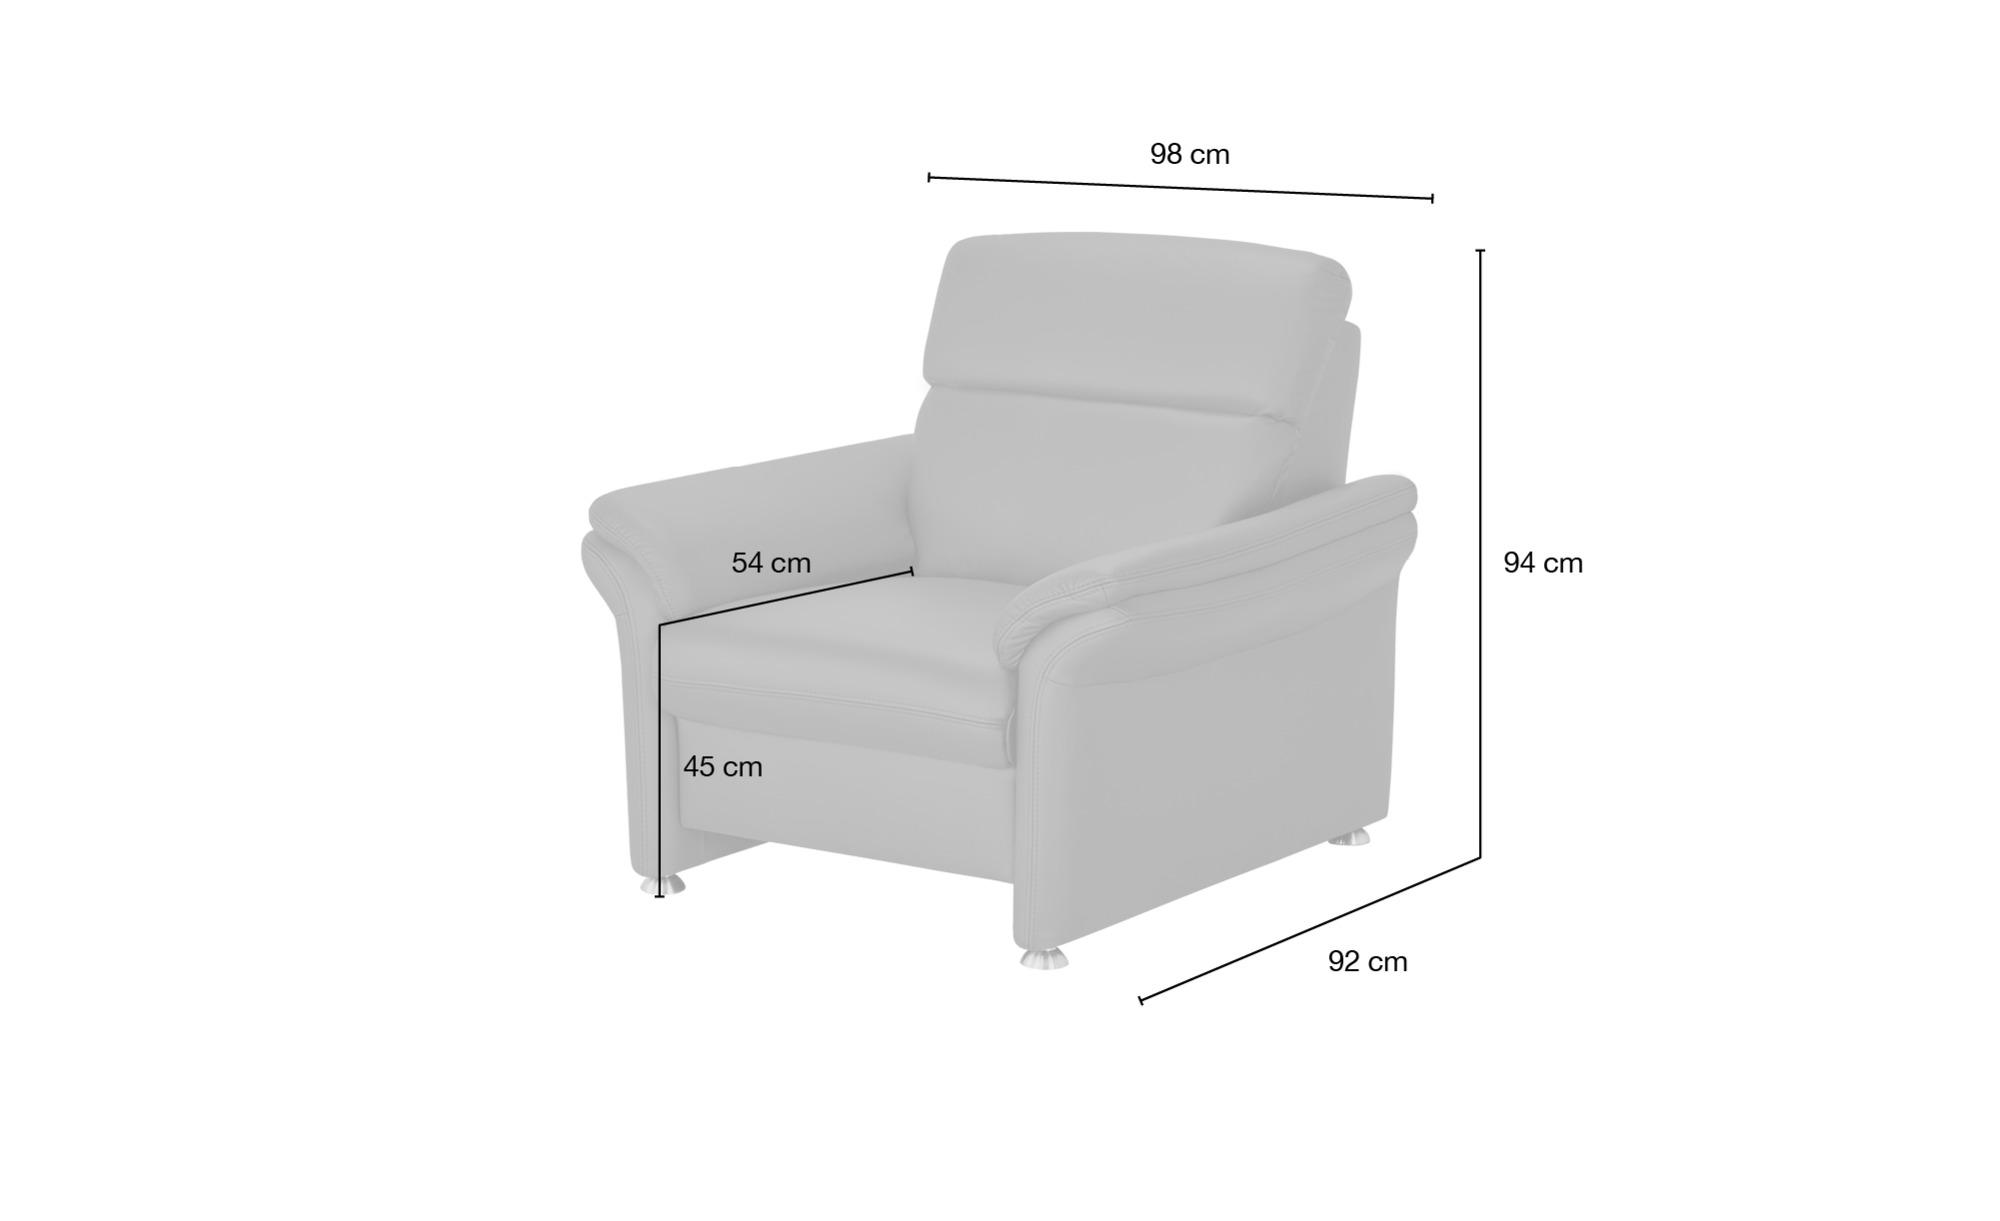 meinSofa Ledersessel schwarz - Leder Manon ¦ schwarz ¦ Maße (cm): B: 98 H: 94 T: 92 Polstermöbel > Sessel > Ledersessel - Höffner